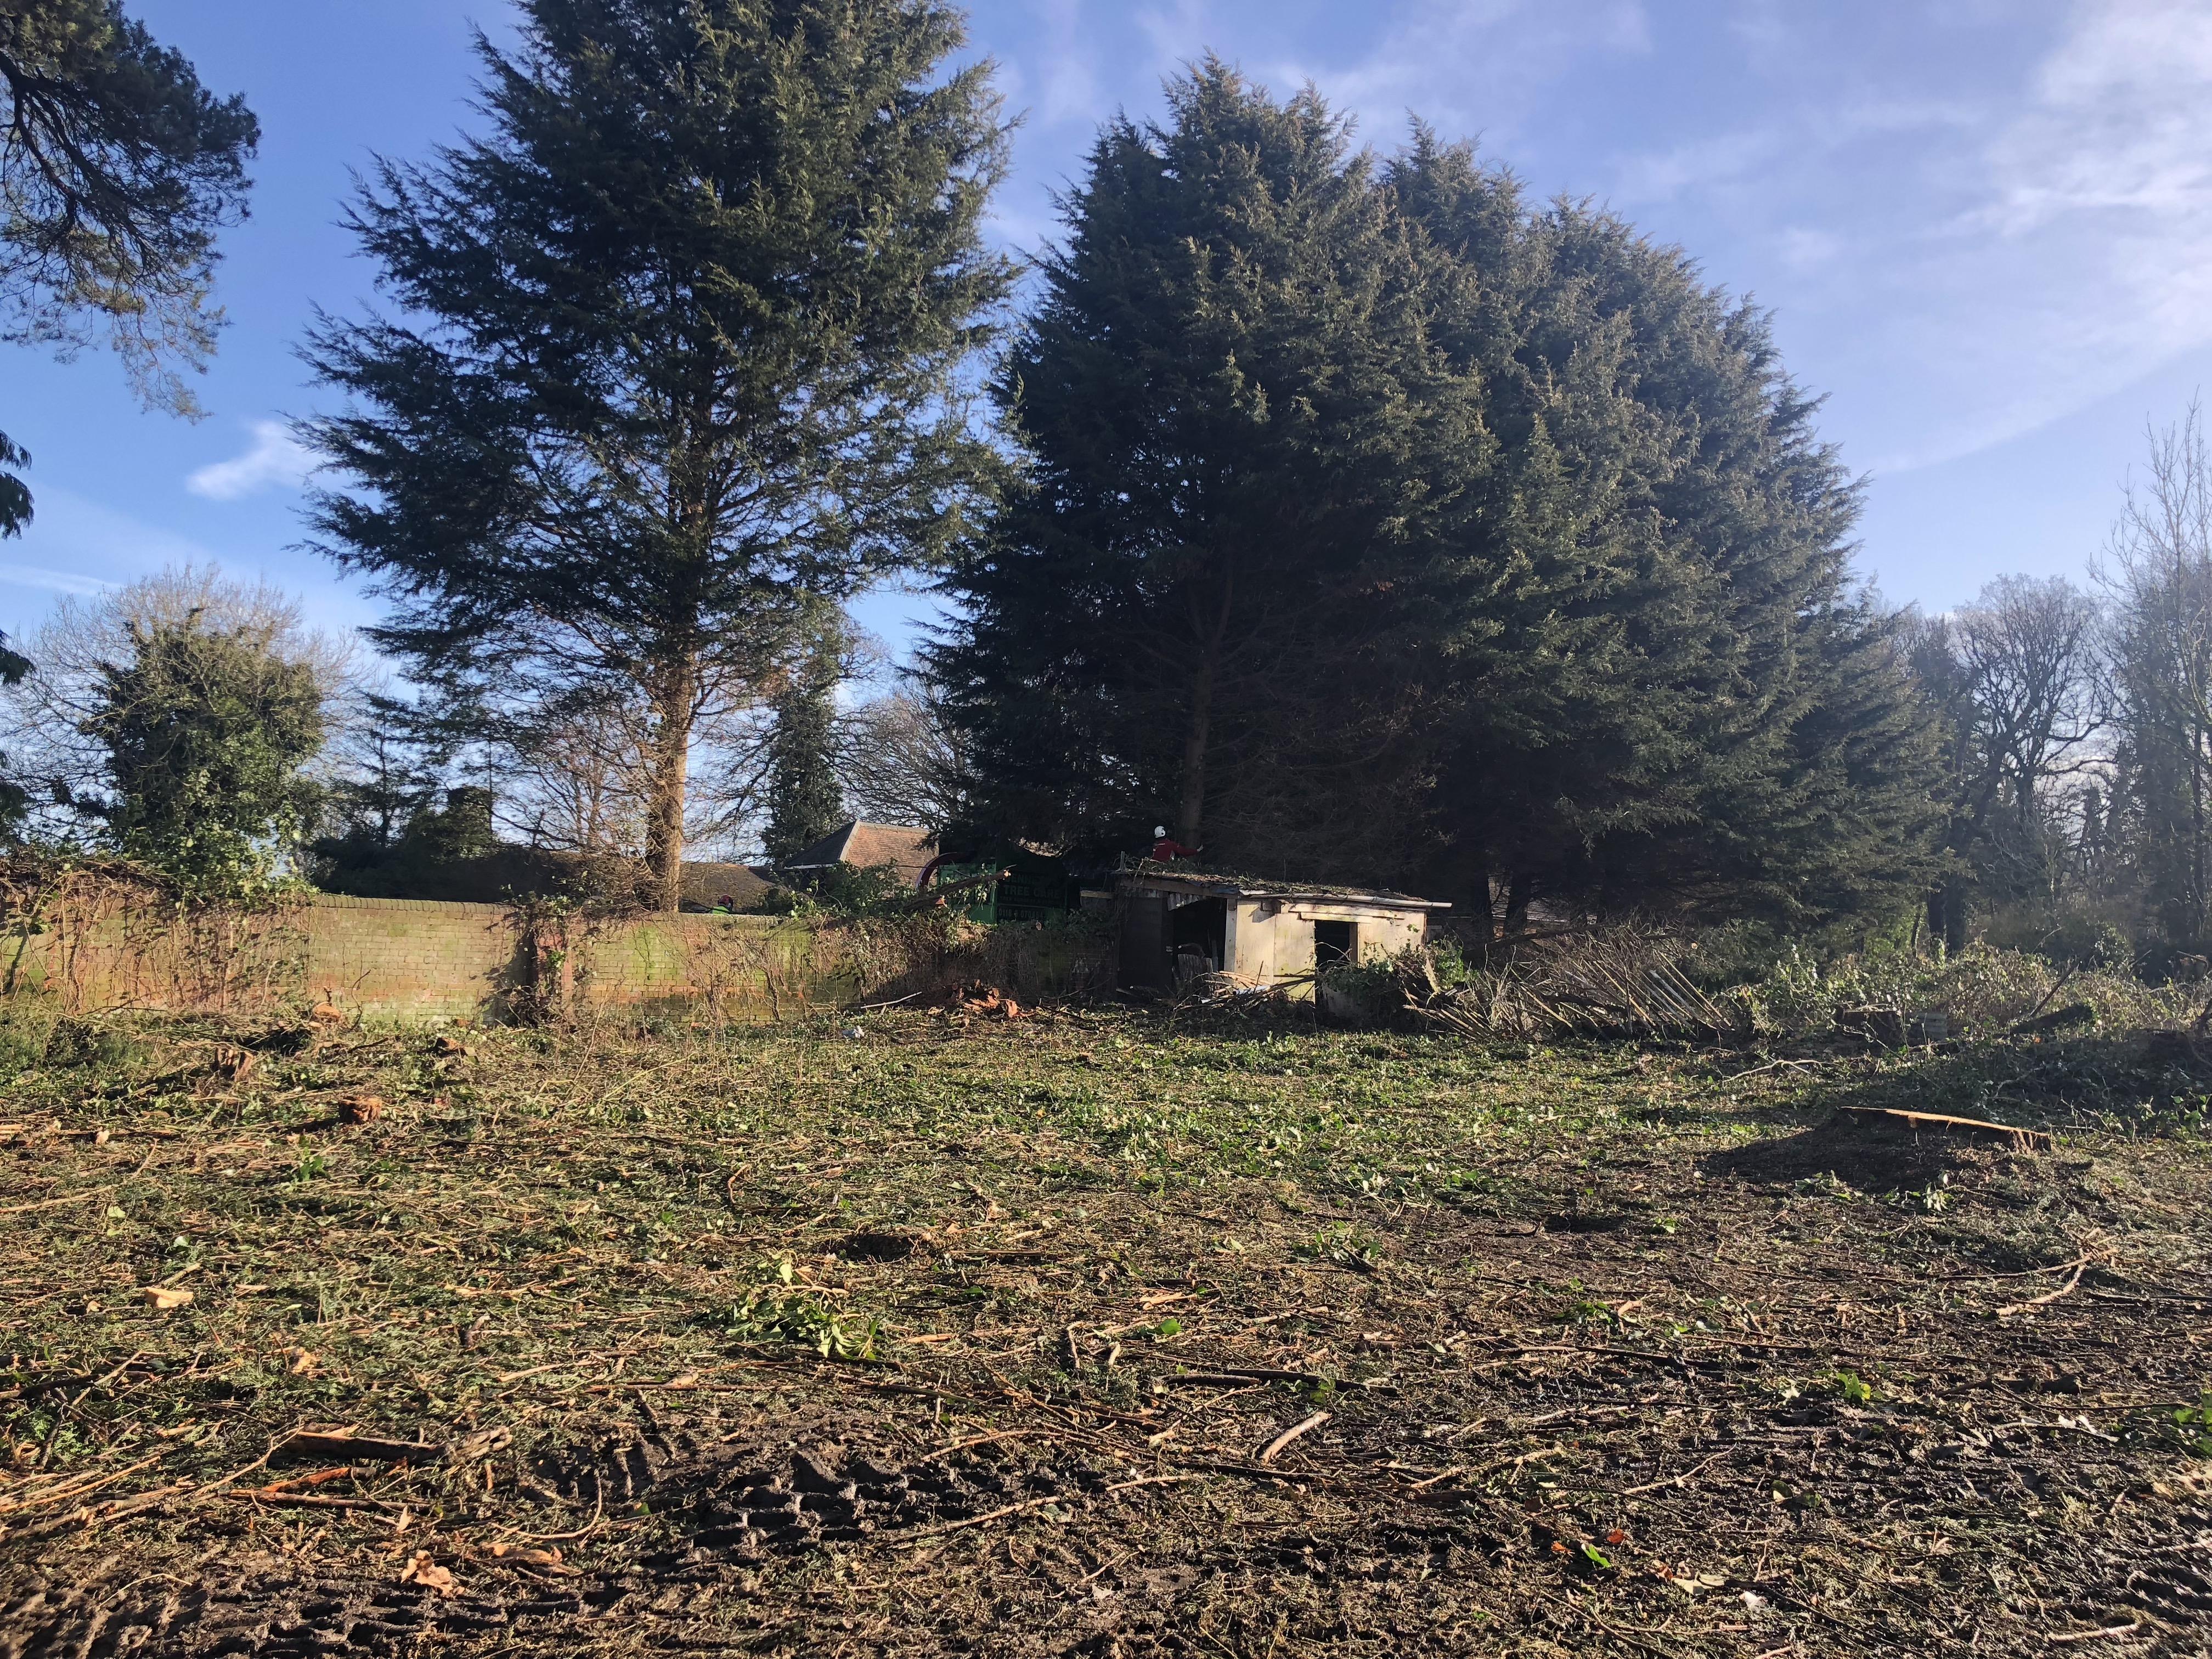 tree felling on site